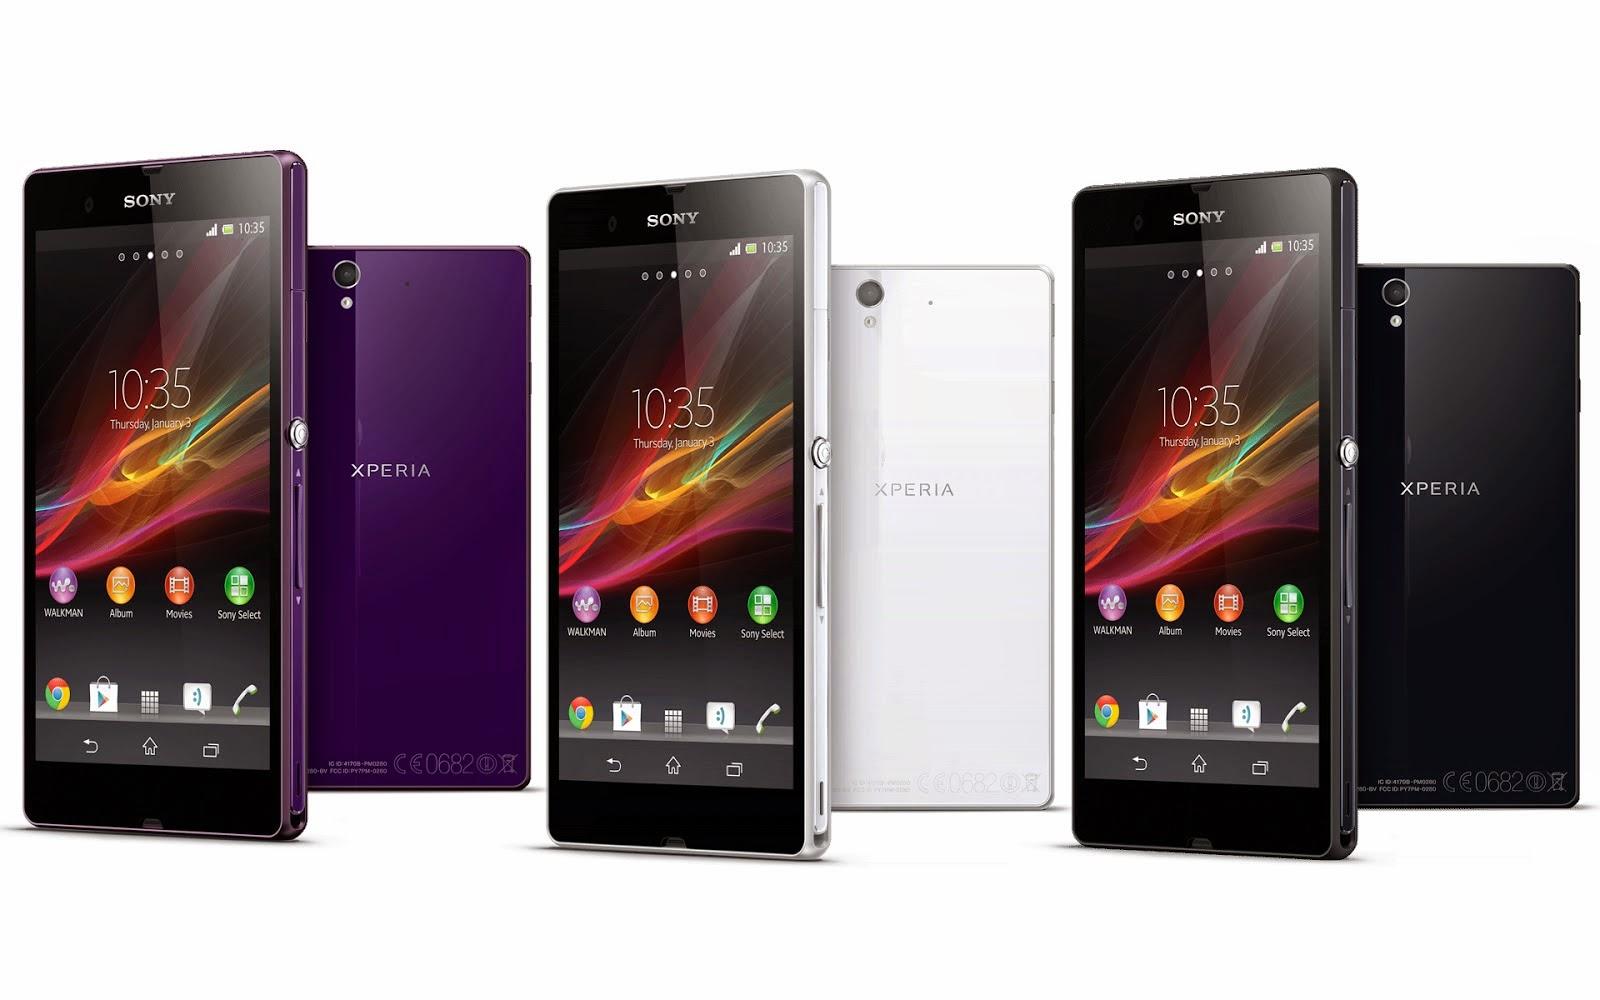 Harga Sony Xperia C dan Spesifikasi Lengkap